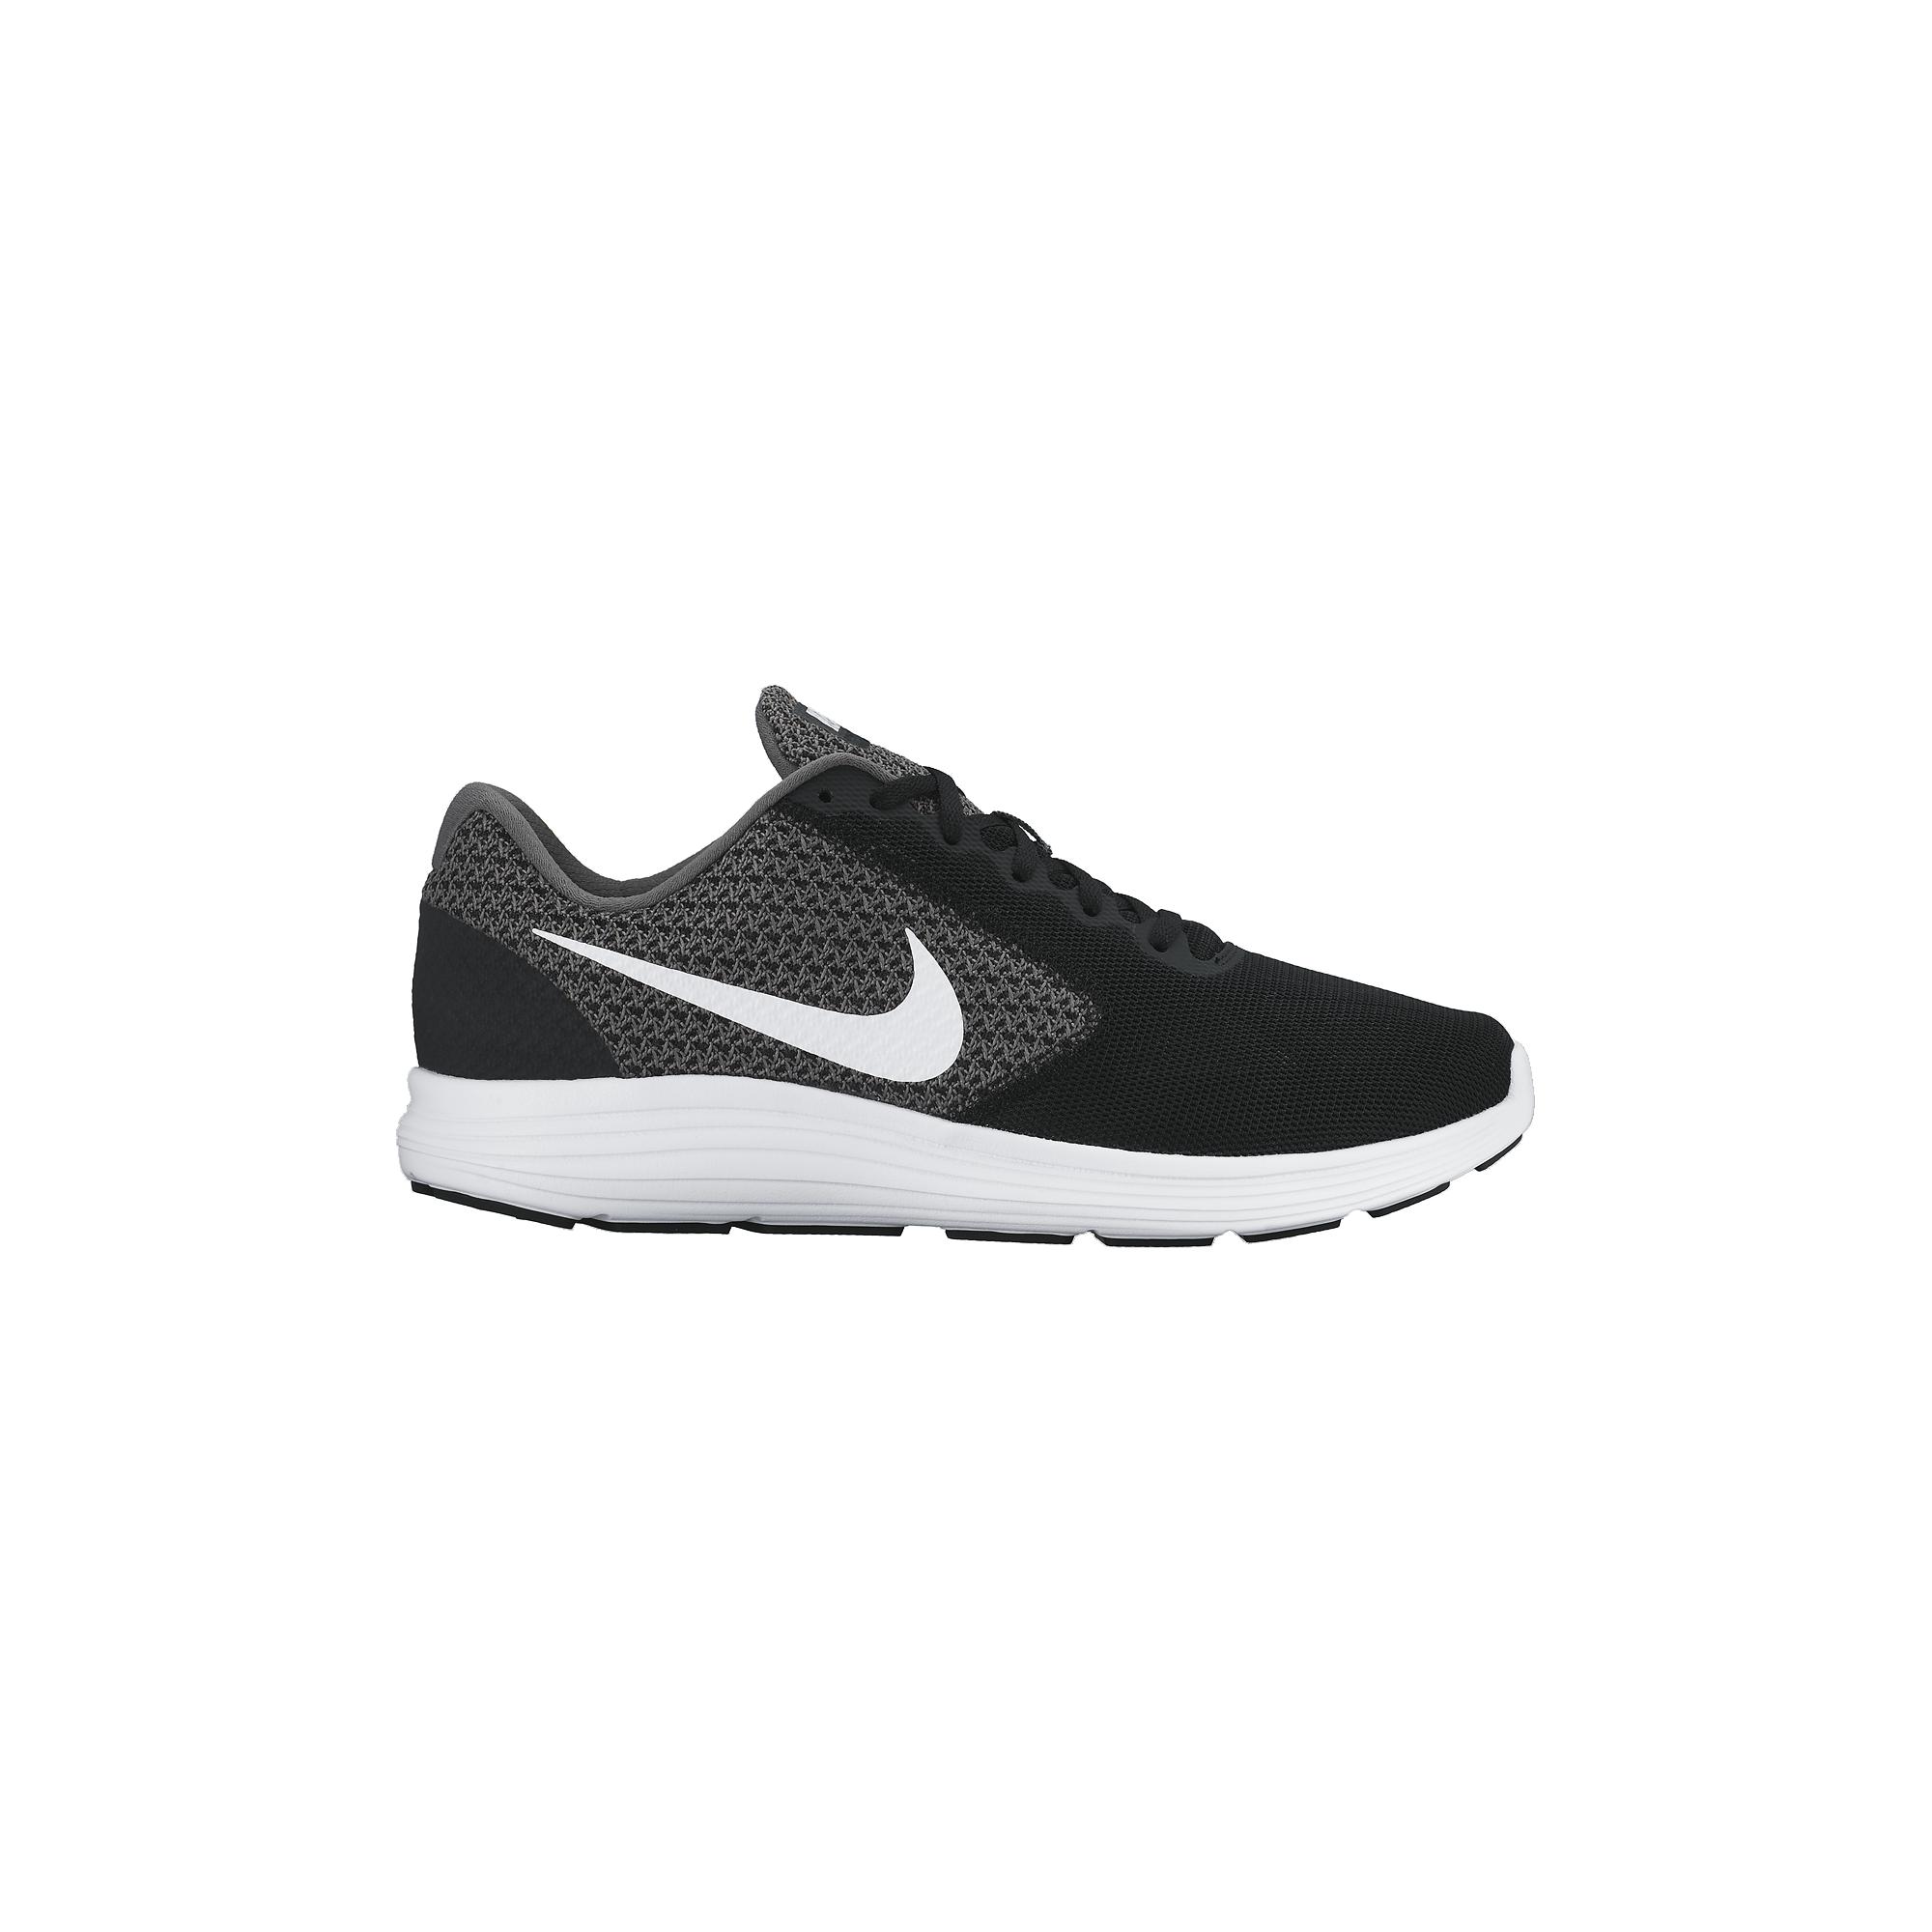 Nike Men S Nike Revolution 3 Running Shoe FÉrfi FutÓ CipŐ 819300-001 Férfi  Cipo c86c2a1e260